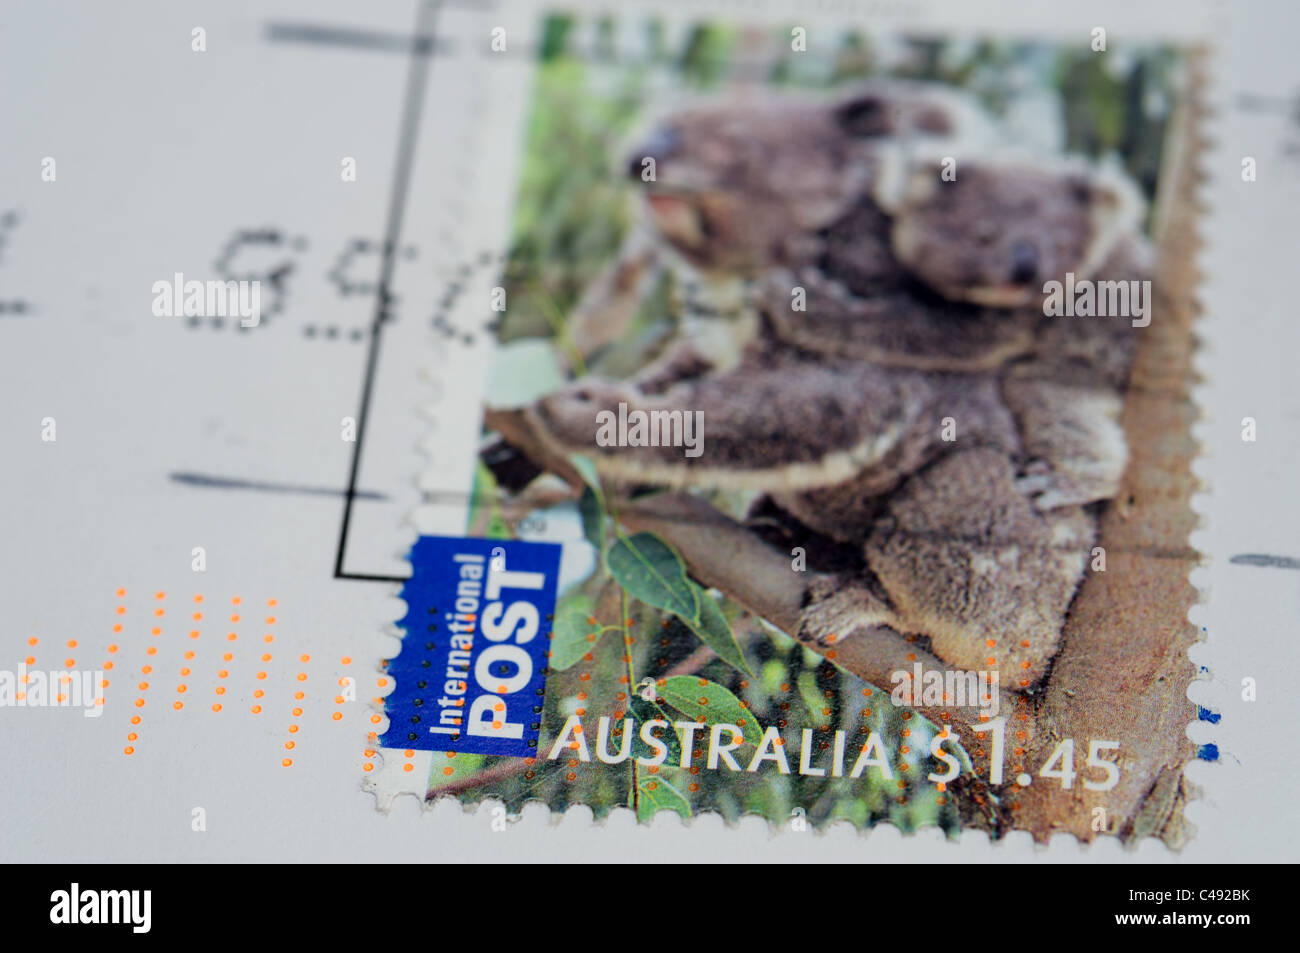 Australia Post international stamp - Stock Image